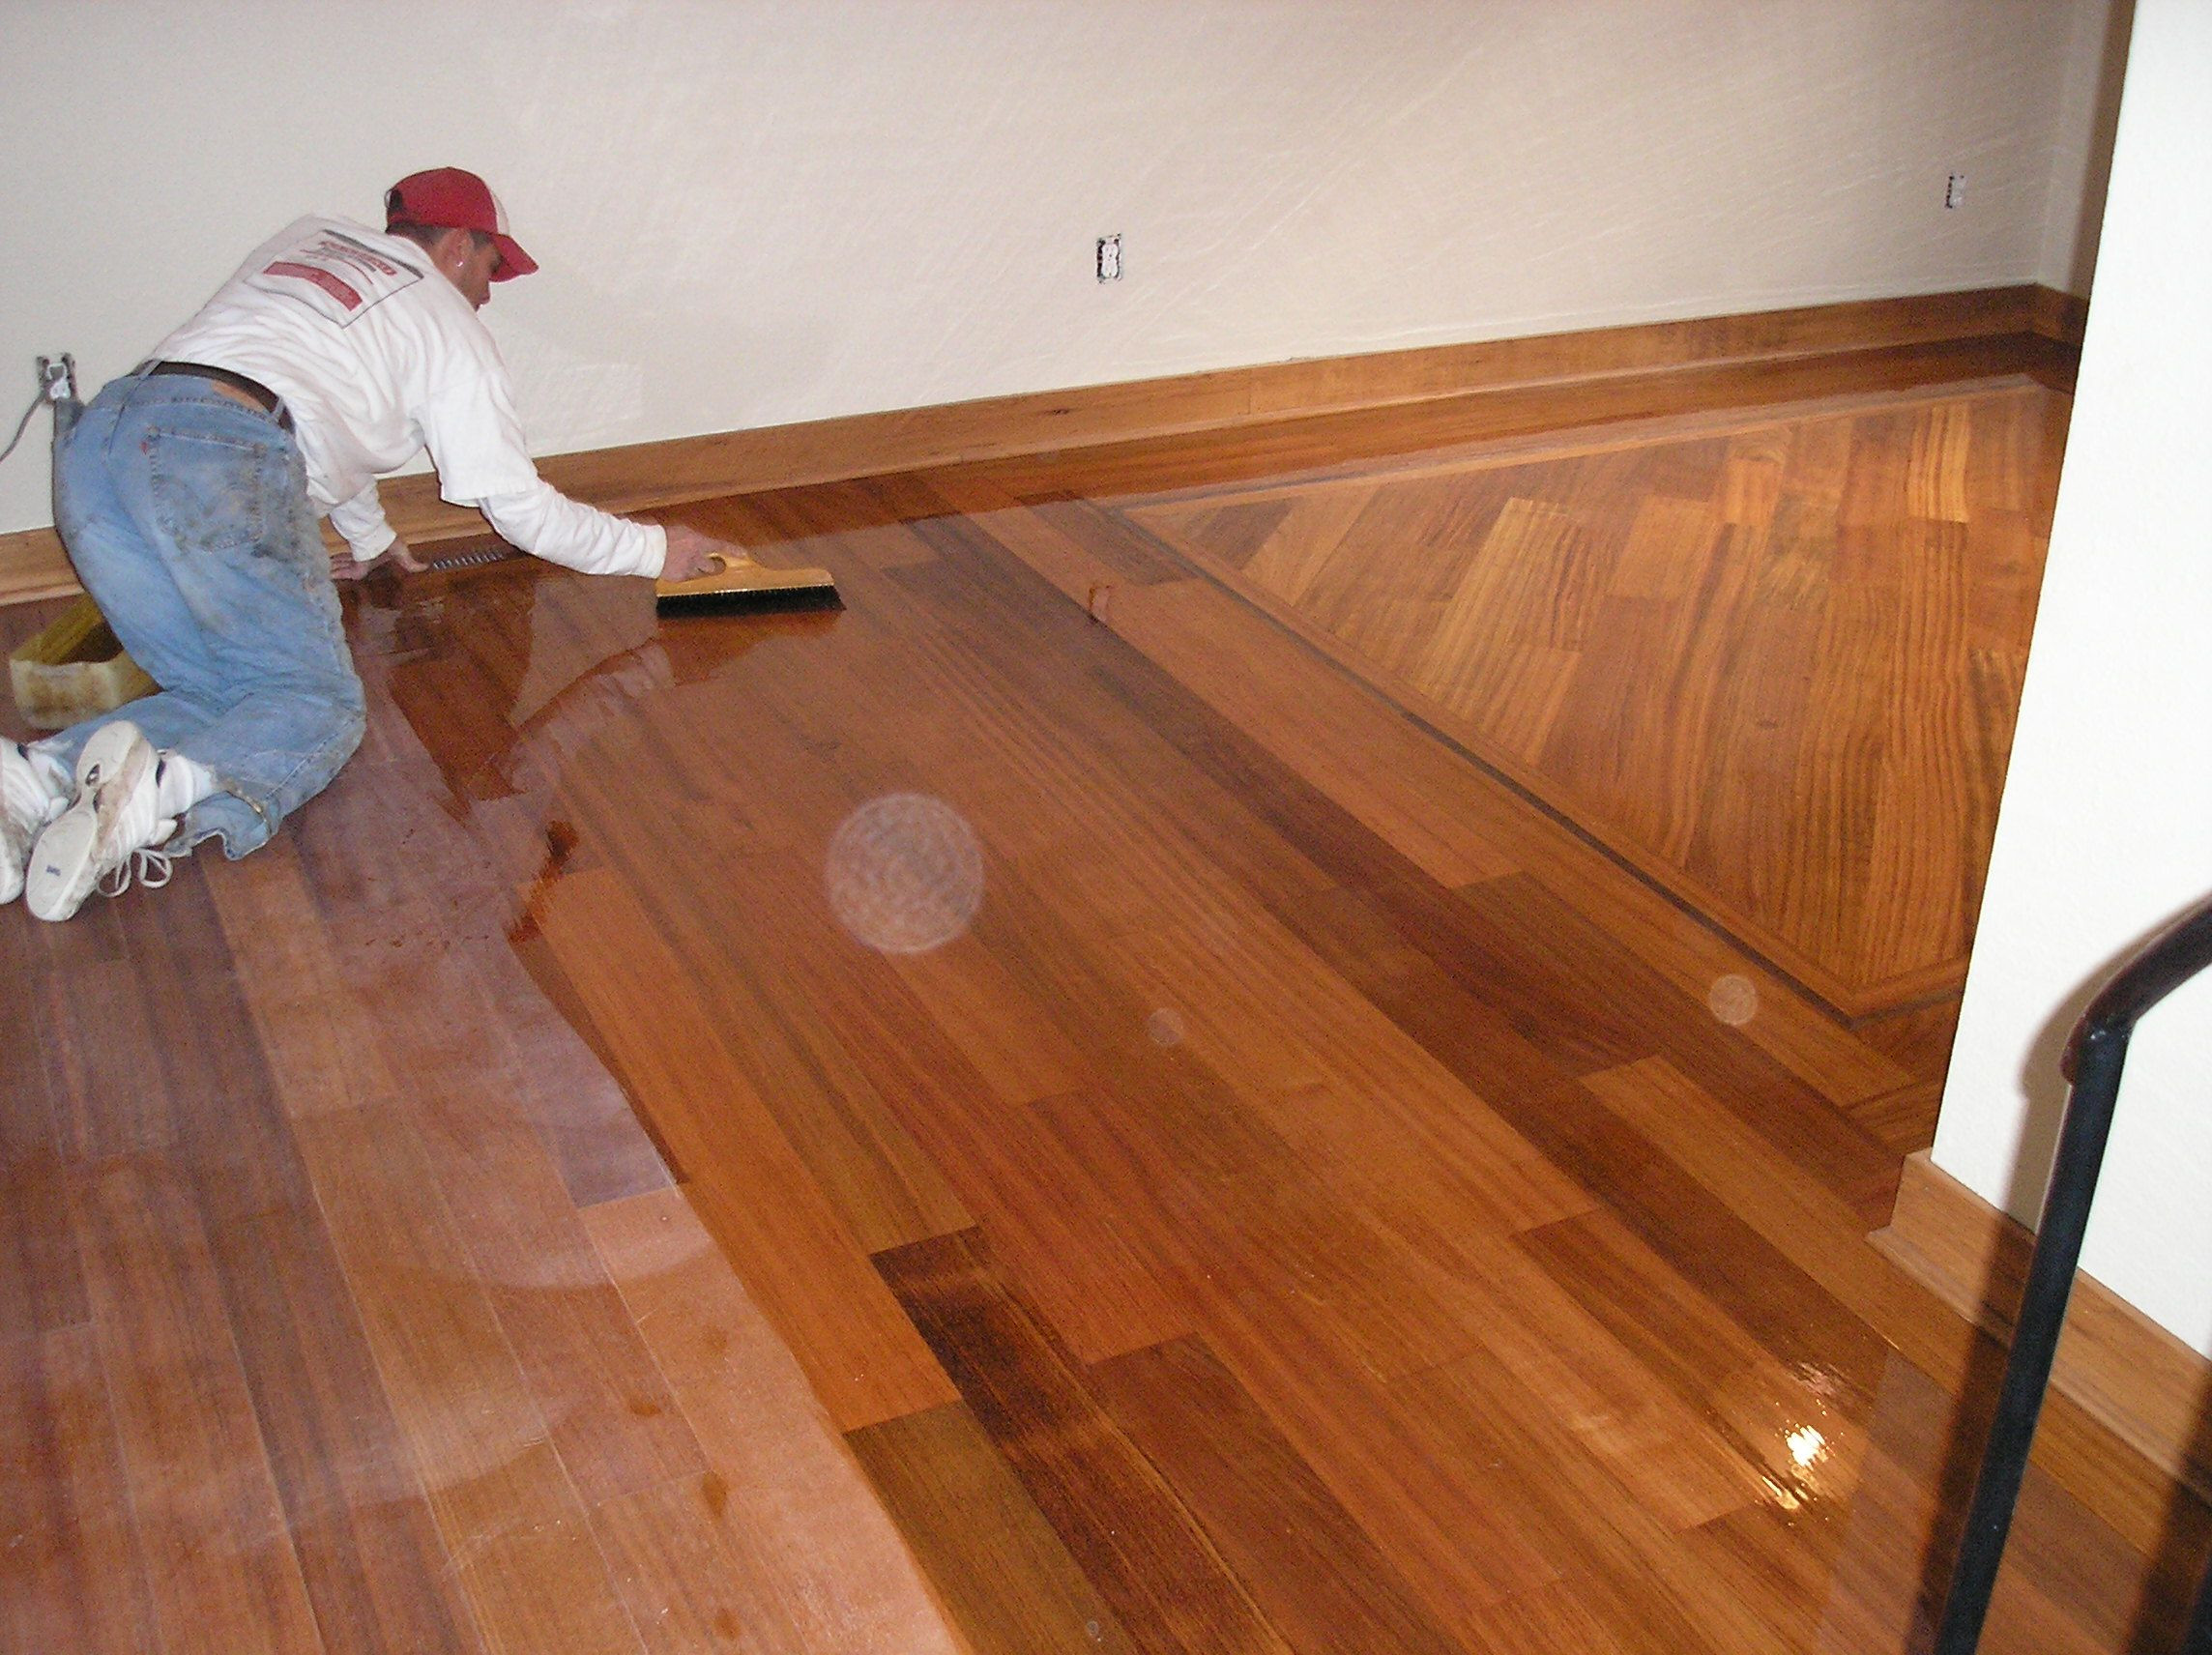 putting hardwood floor on concrete slab of papas flooring papasflooring on pinterest throughout papas flooring papasflooring on pinterest